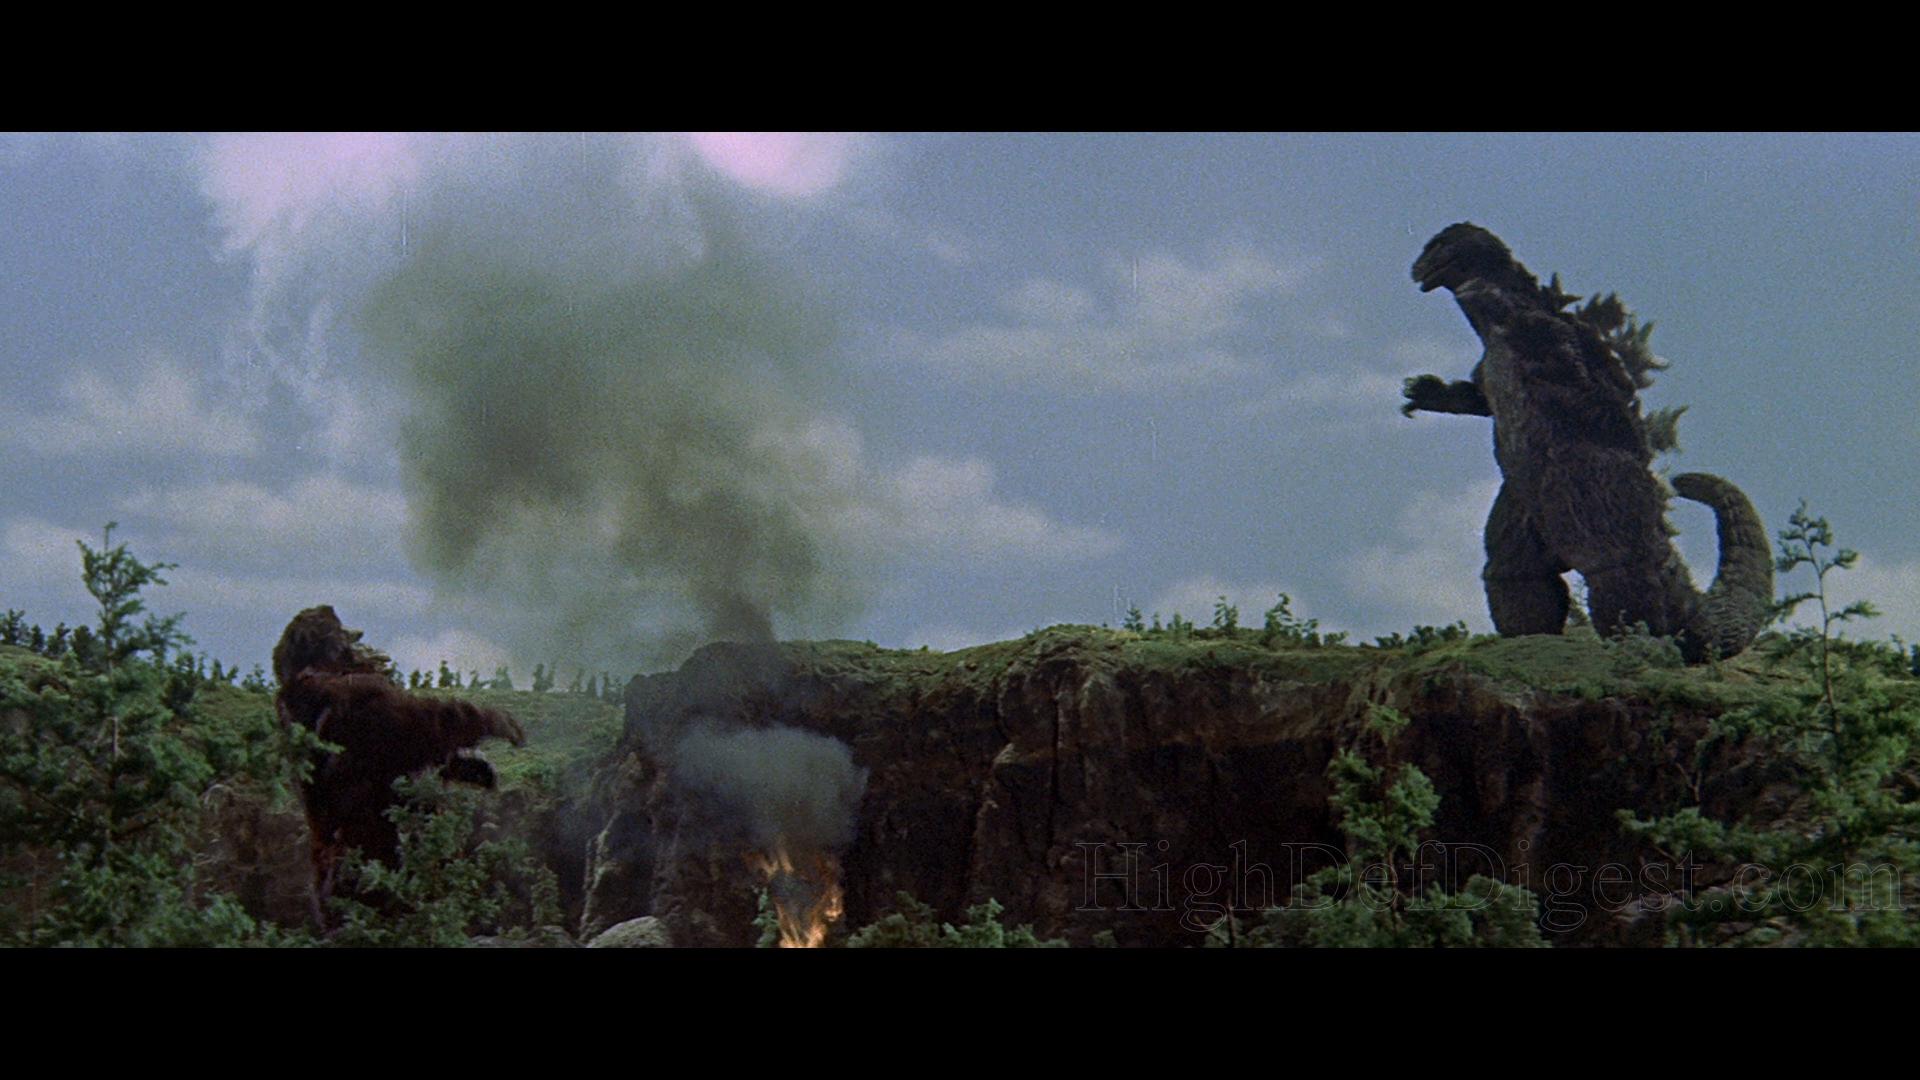 King Kong vs. Godzilla Blu-ray Review | High Def Digest